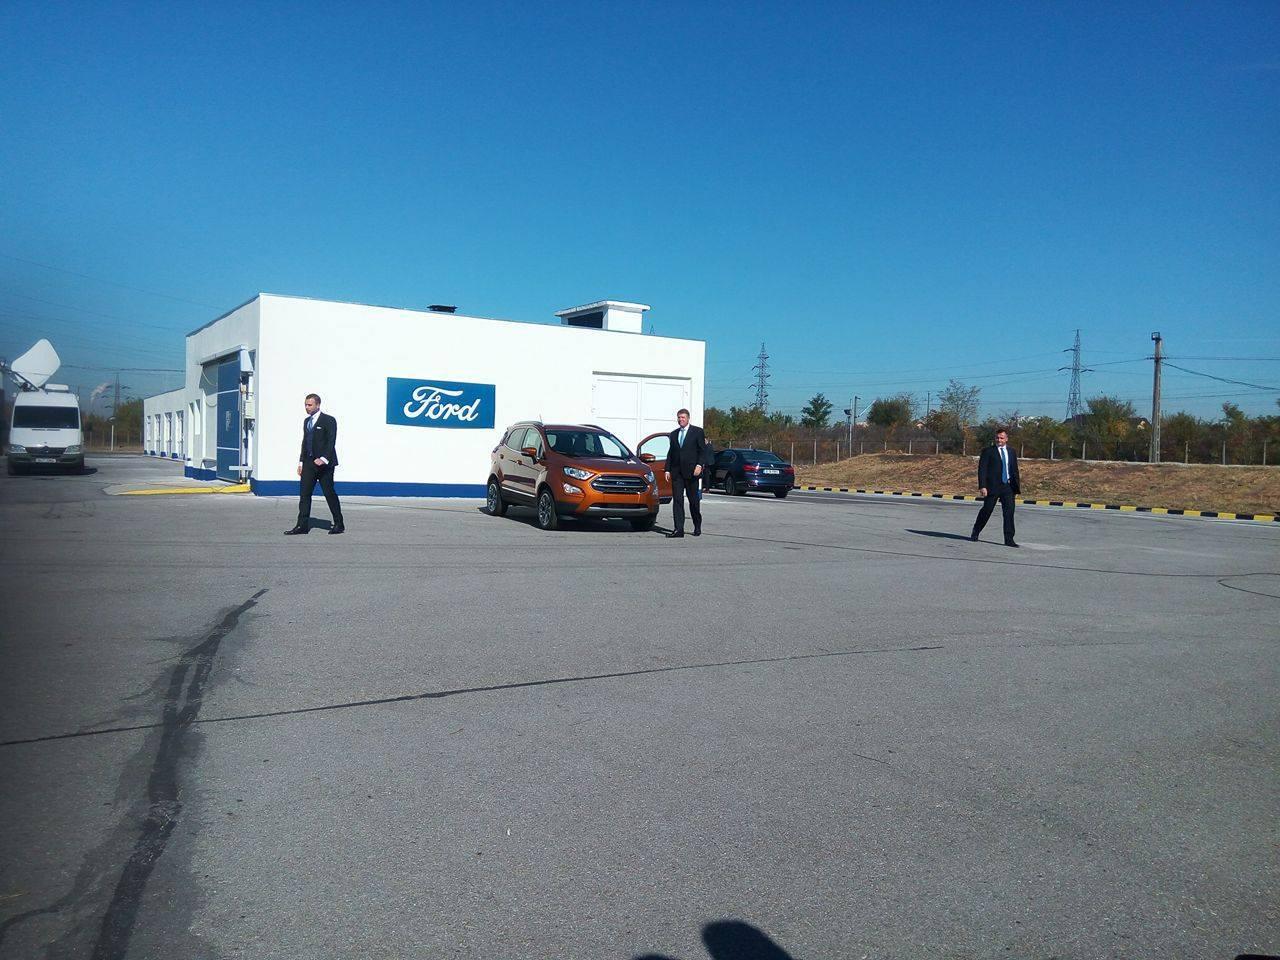 Iohannis a făcut, la Craiova, un drivetest cu noul Ford EcoSport | GALERIE FOTO